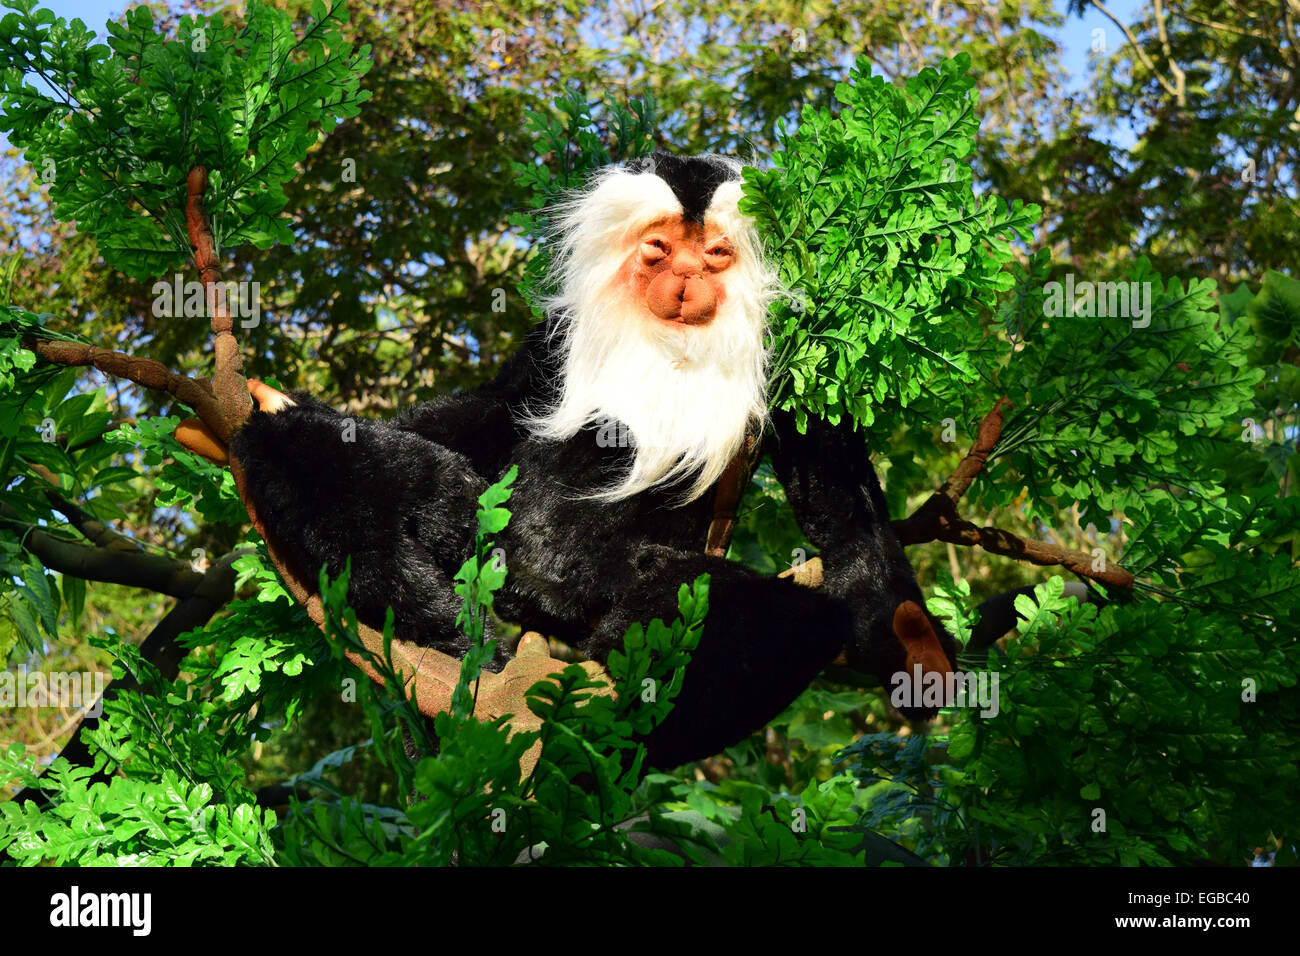 Thermocol Polystyrene Monkey Figure During Onam Festival Procession Float  At Kerala India   Stock Image